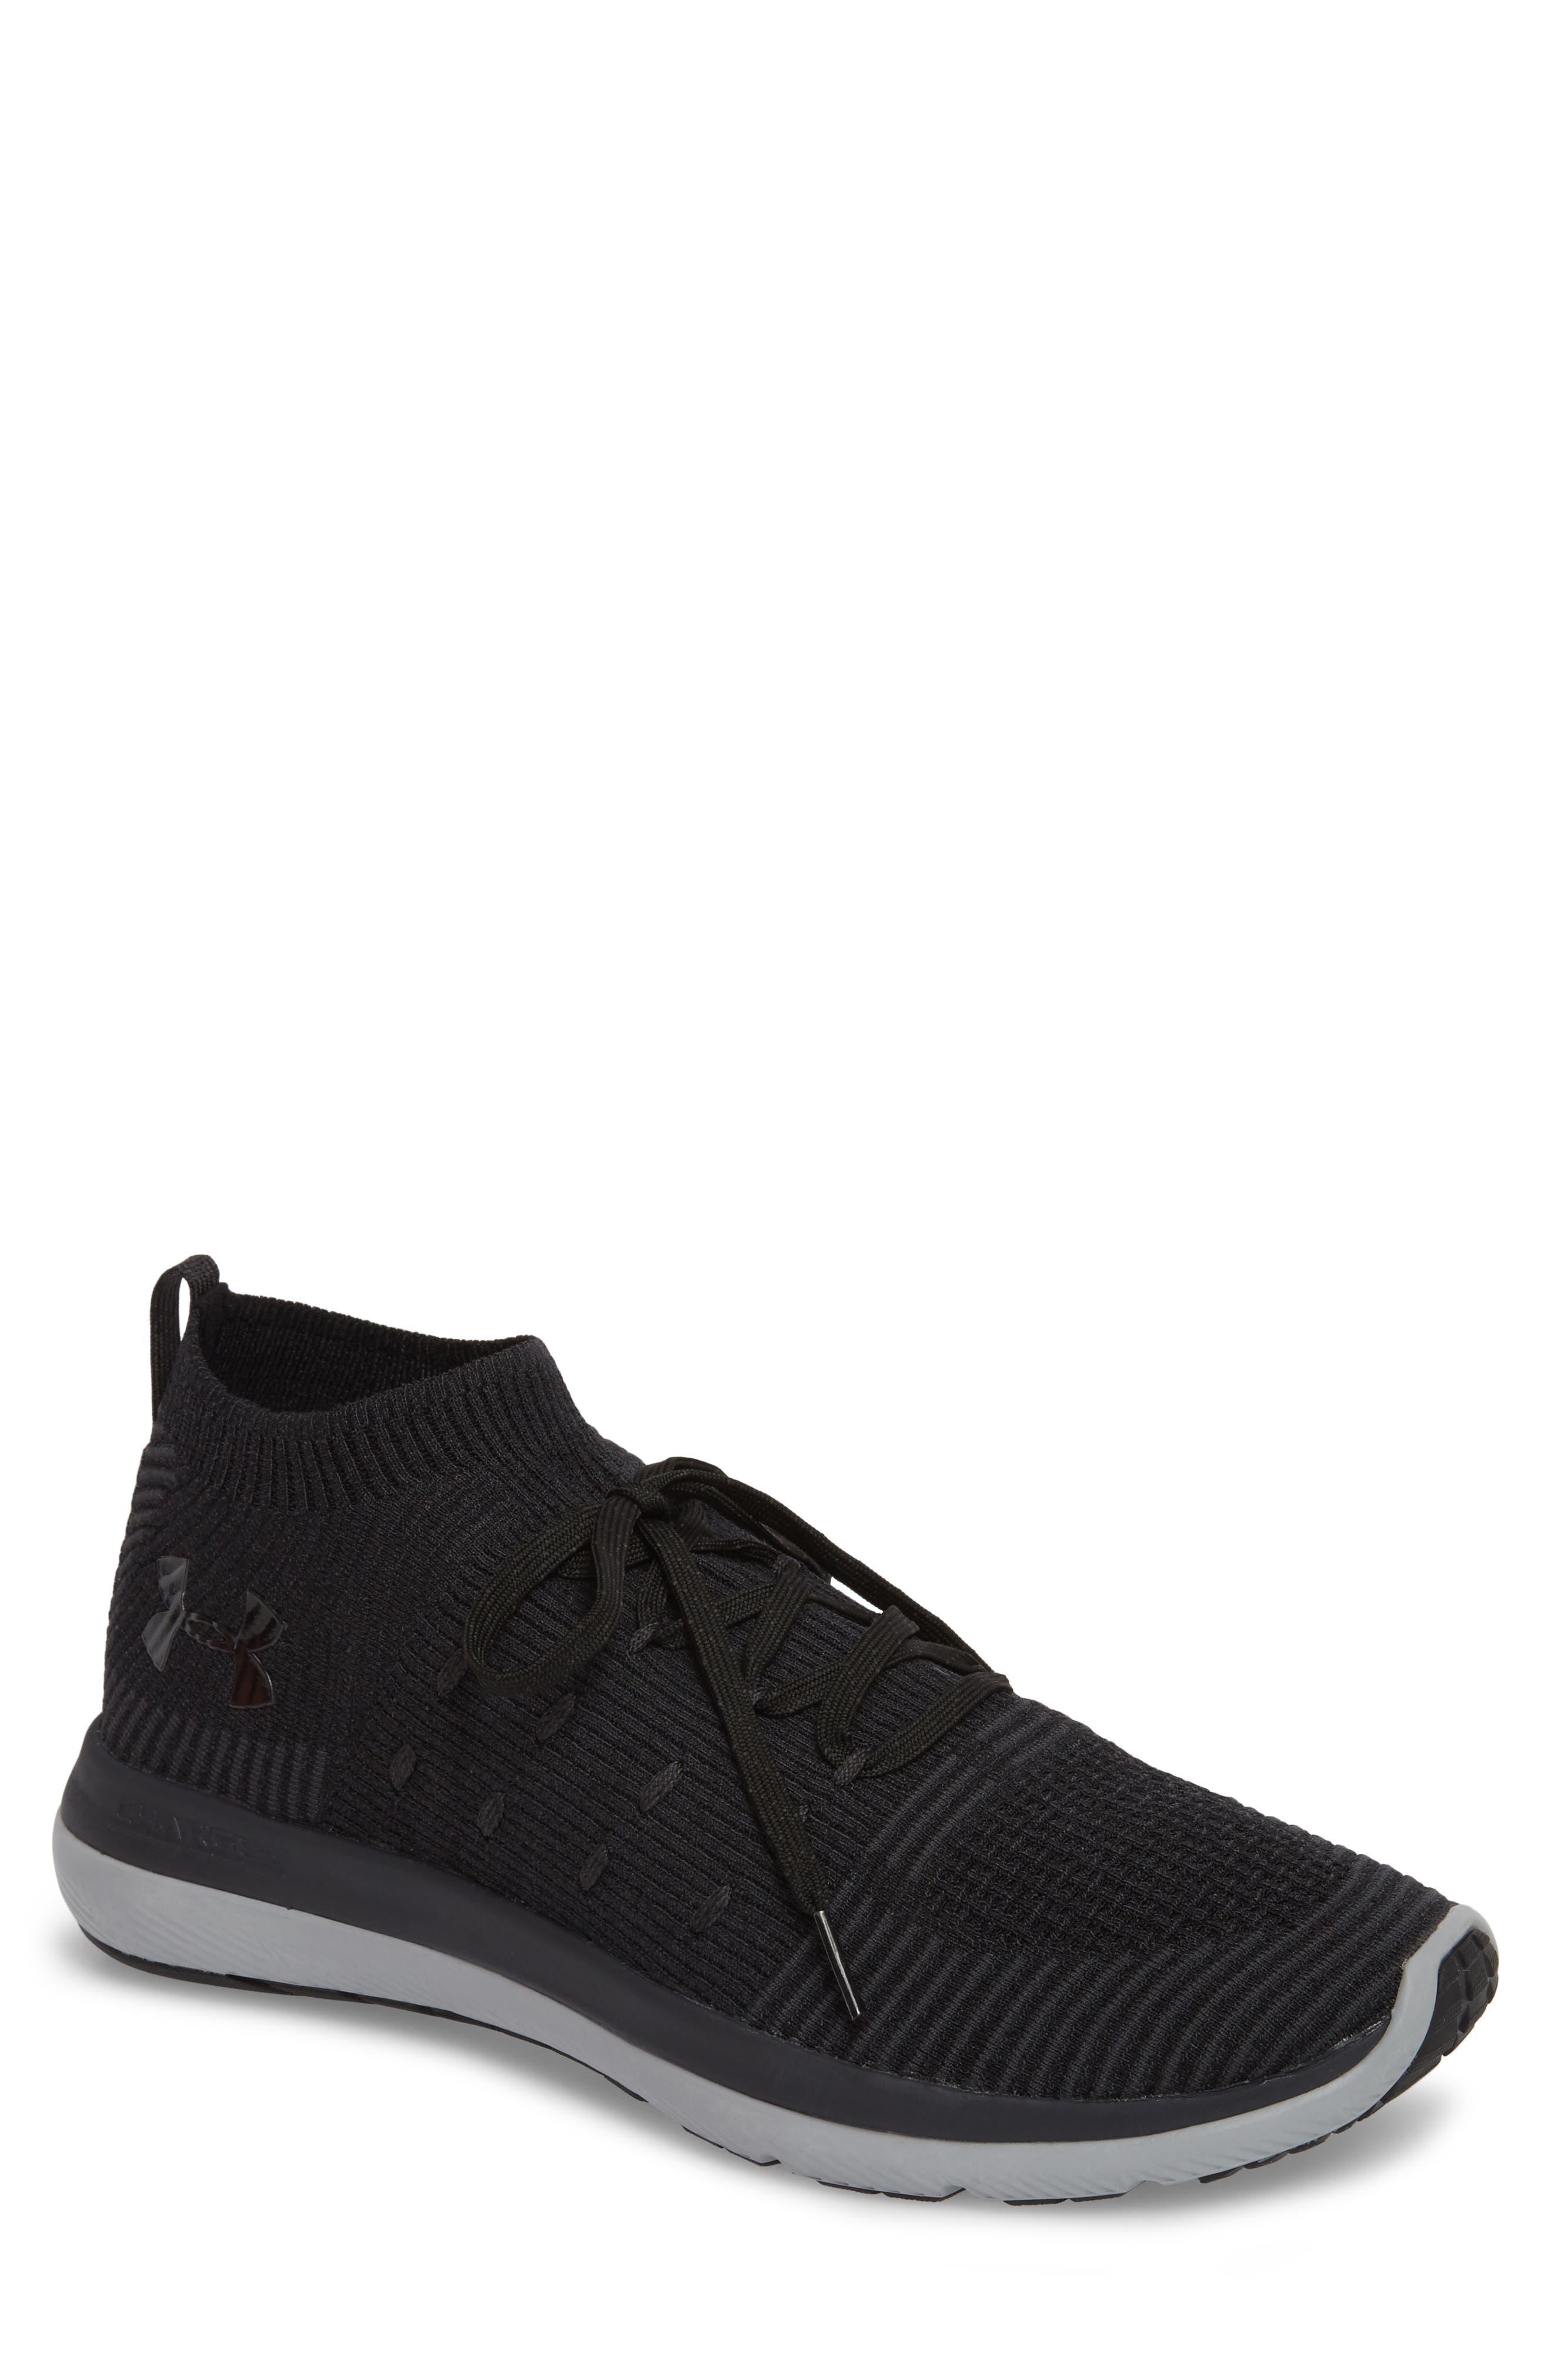 Slingflex Rise Sneaker,                         Main,                         color, BLACK / ANTHRACITE / BLACK